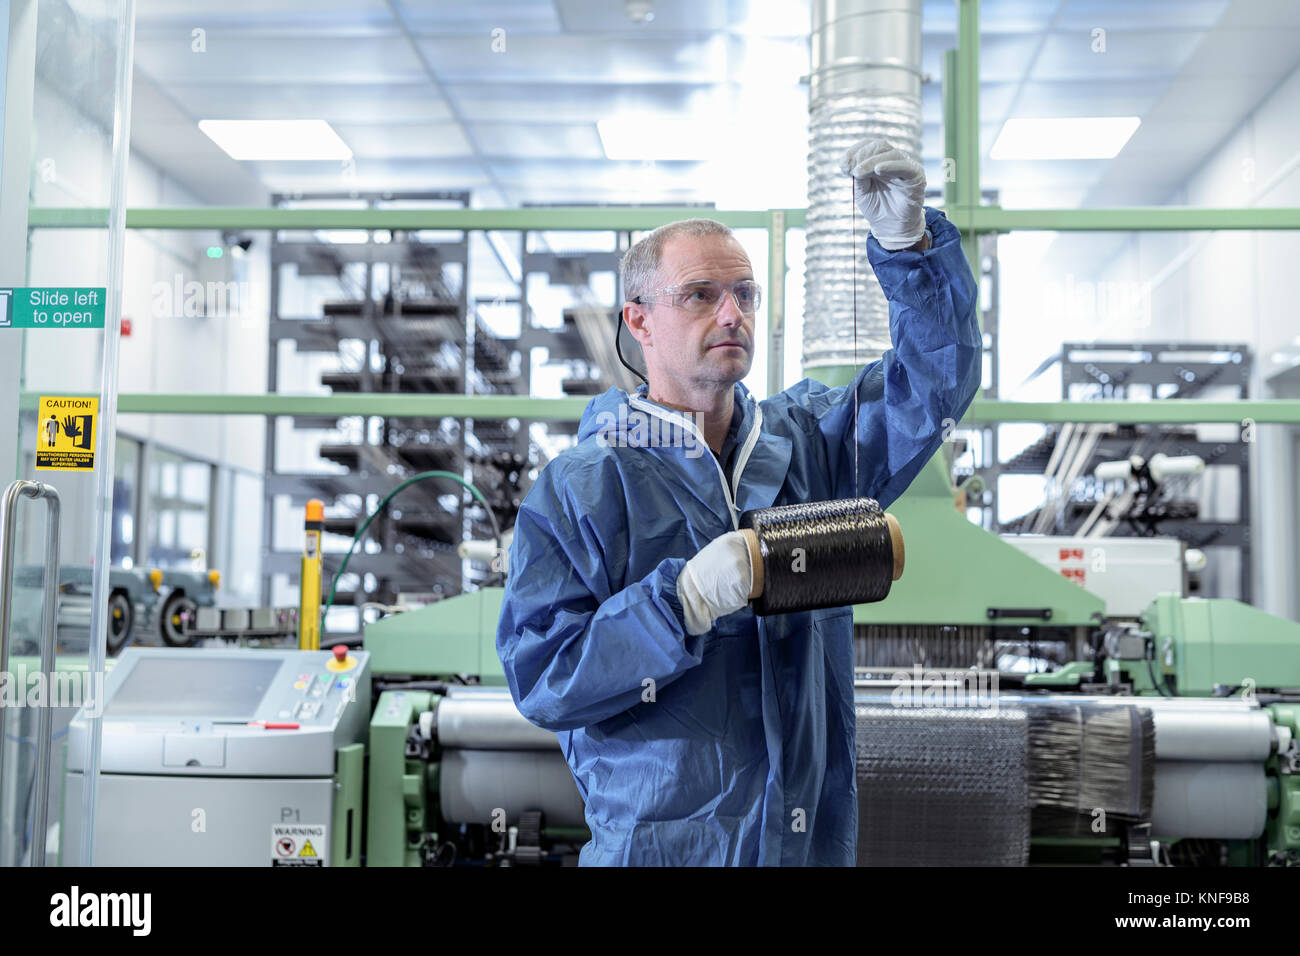 Operator with bobbin of carbon fibre in carbon fibre production facility - Stock Image